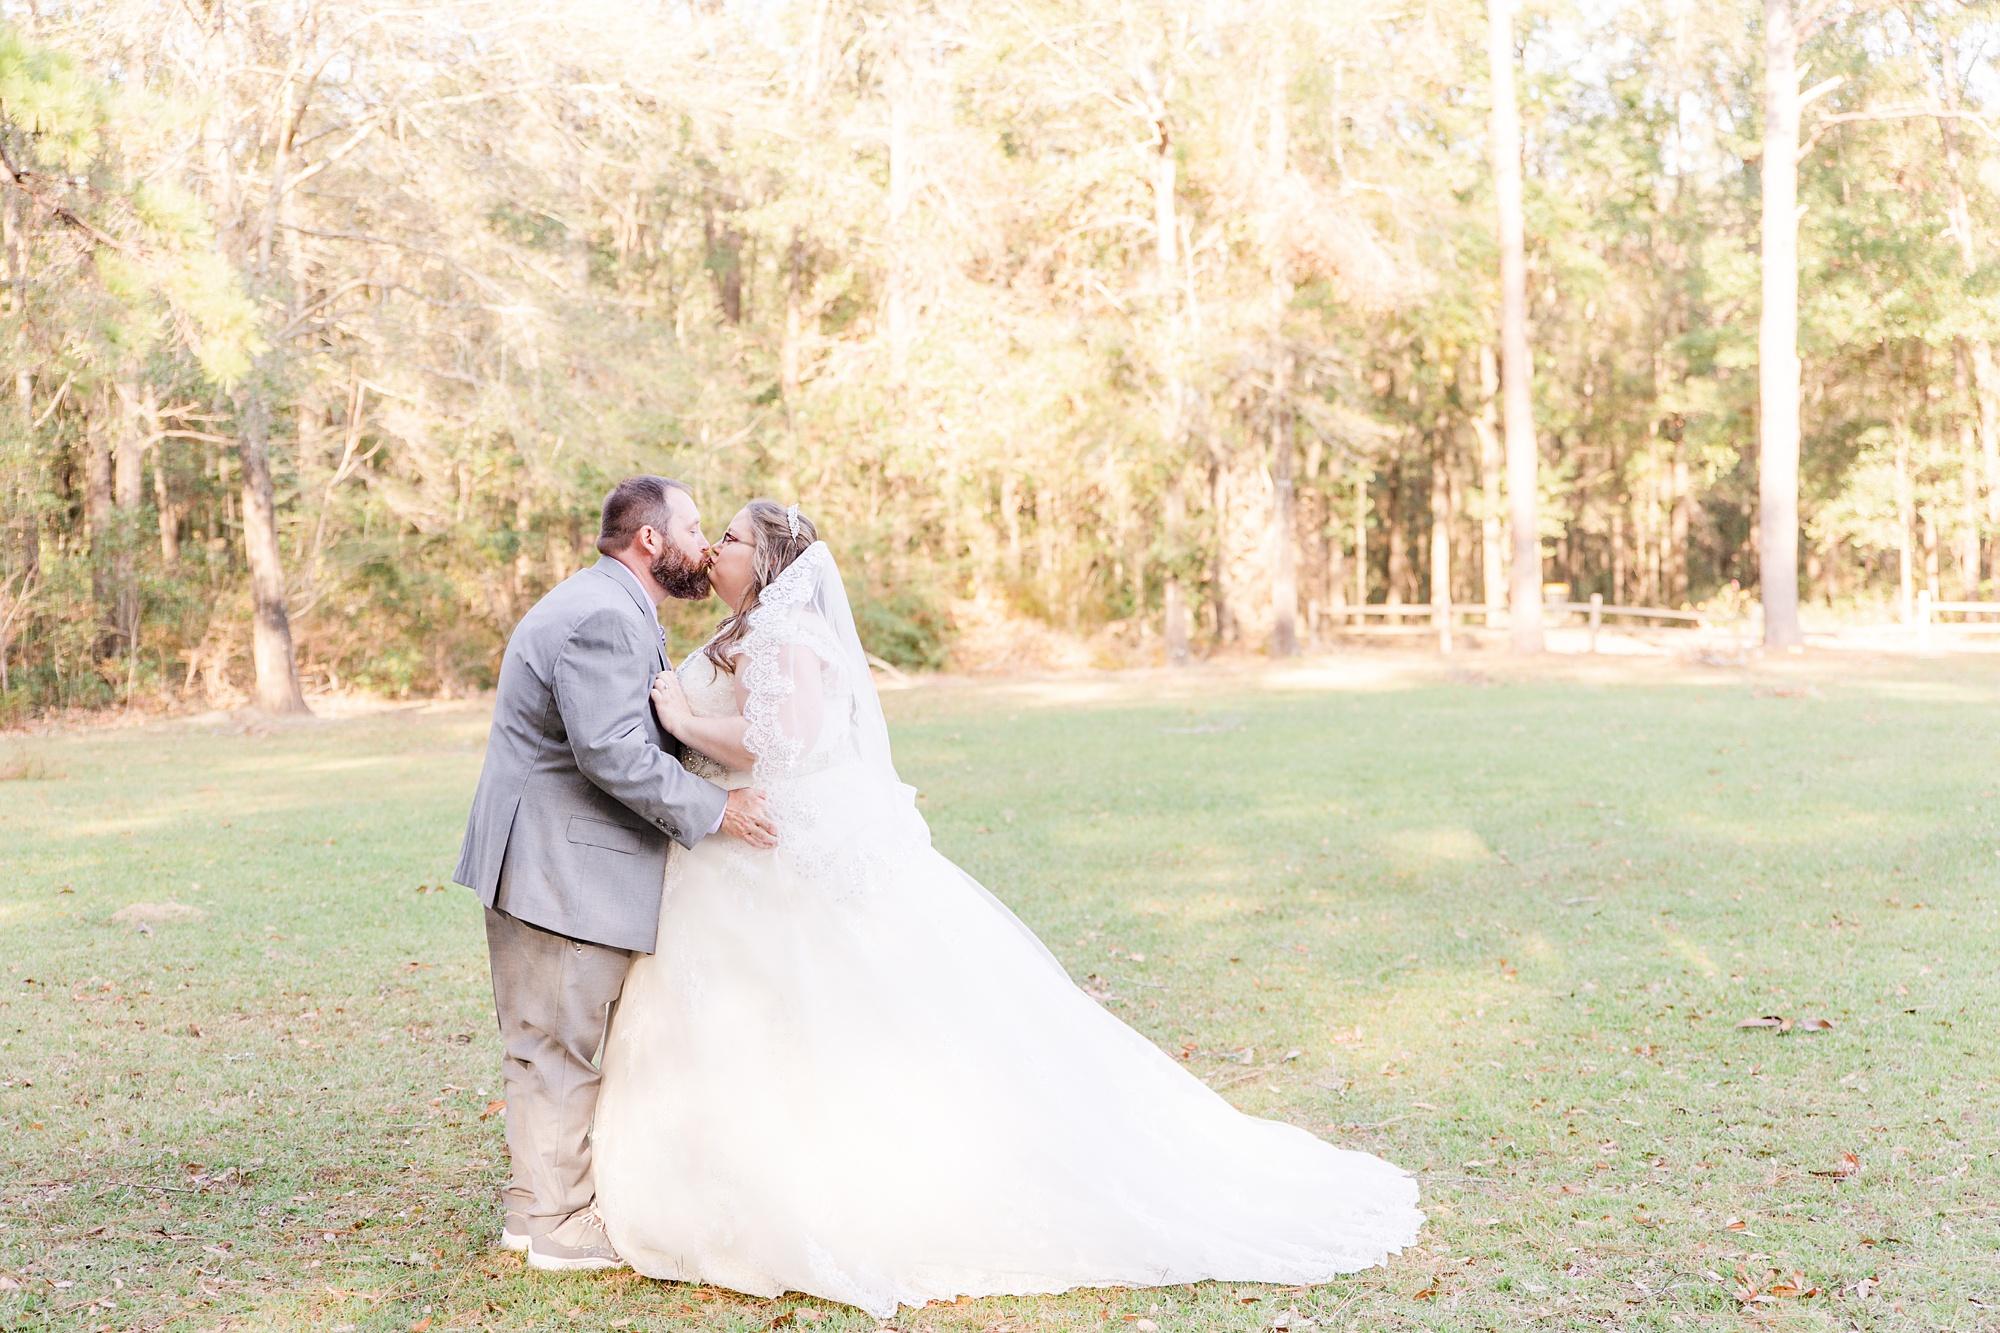 newlyweds kiss during intimate Satsuma wedding photos